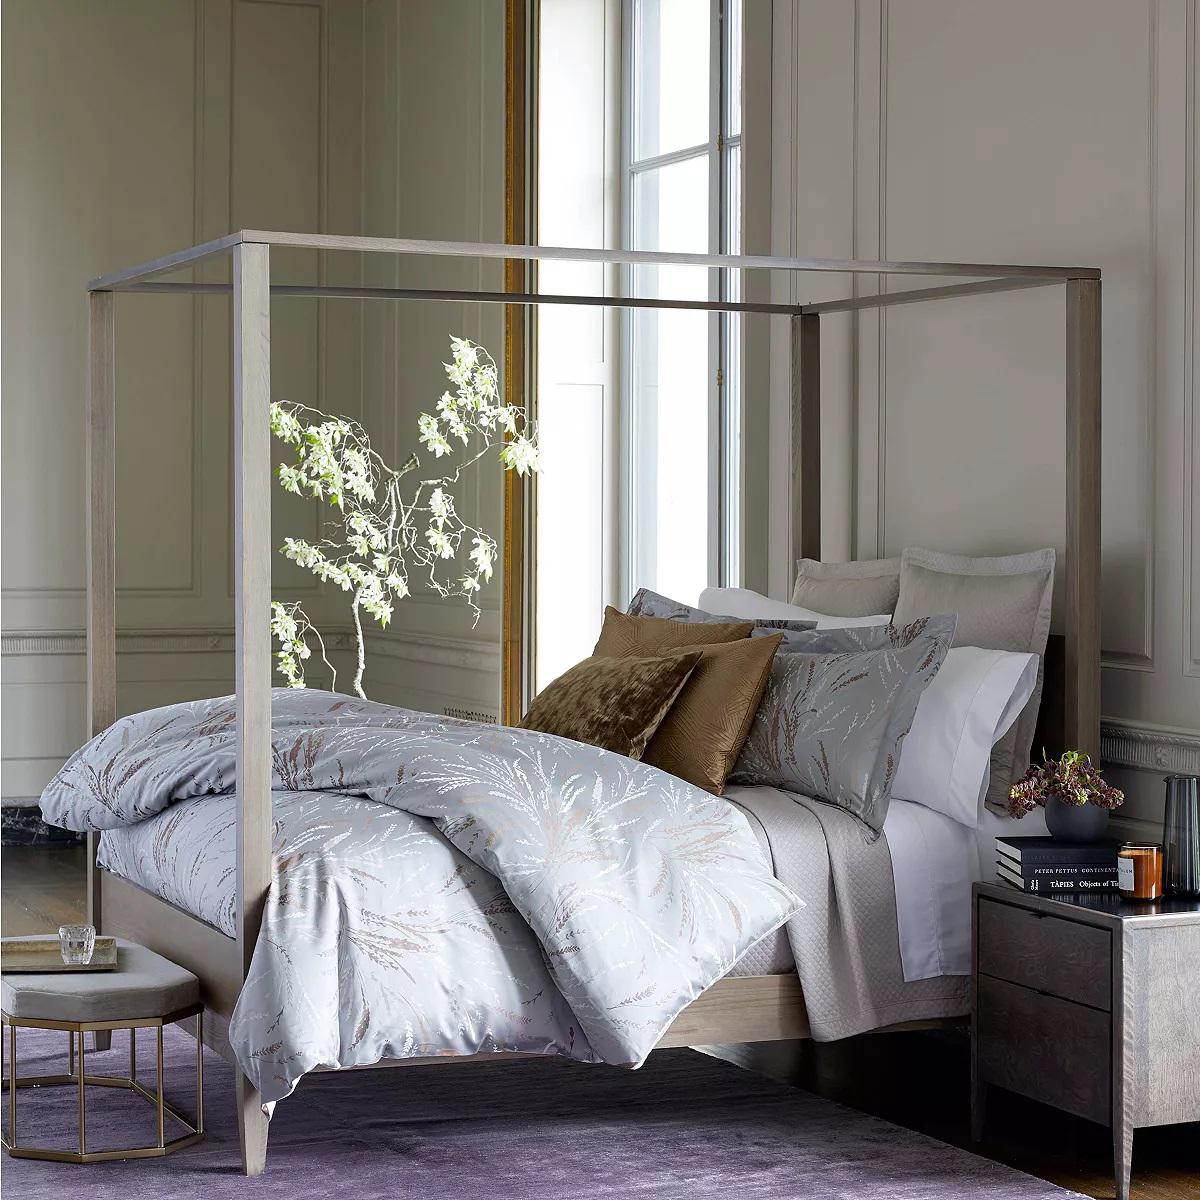 Frette Flourish Arredo Designer Luxury Bedding